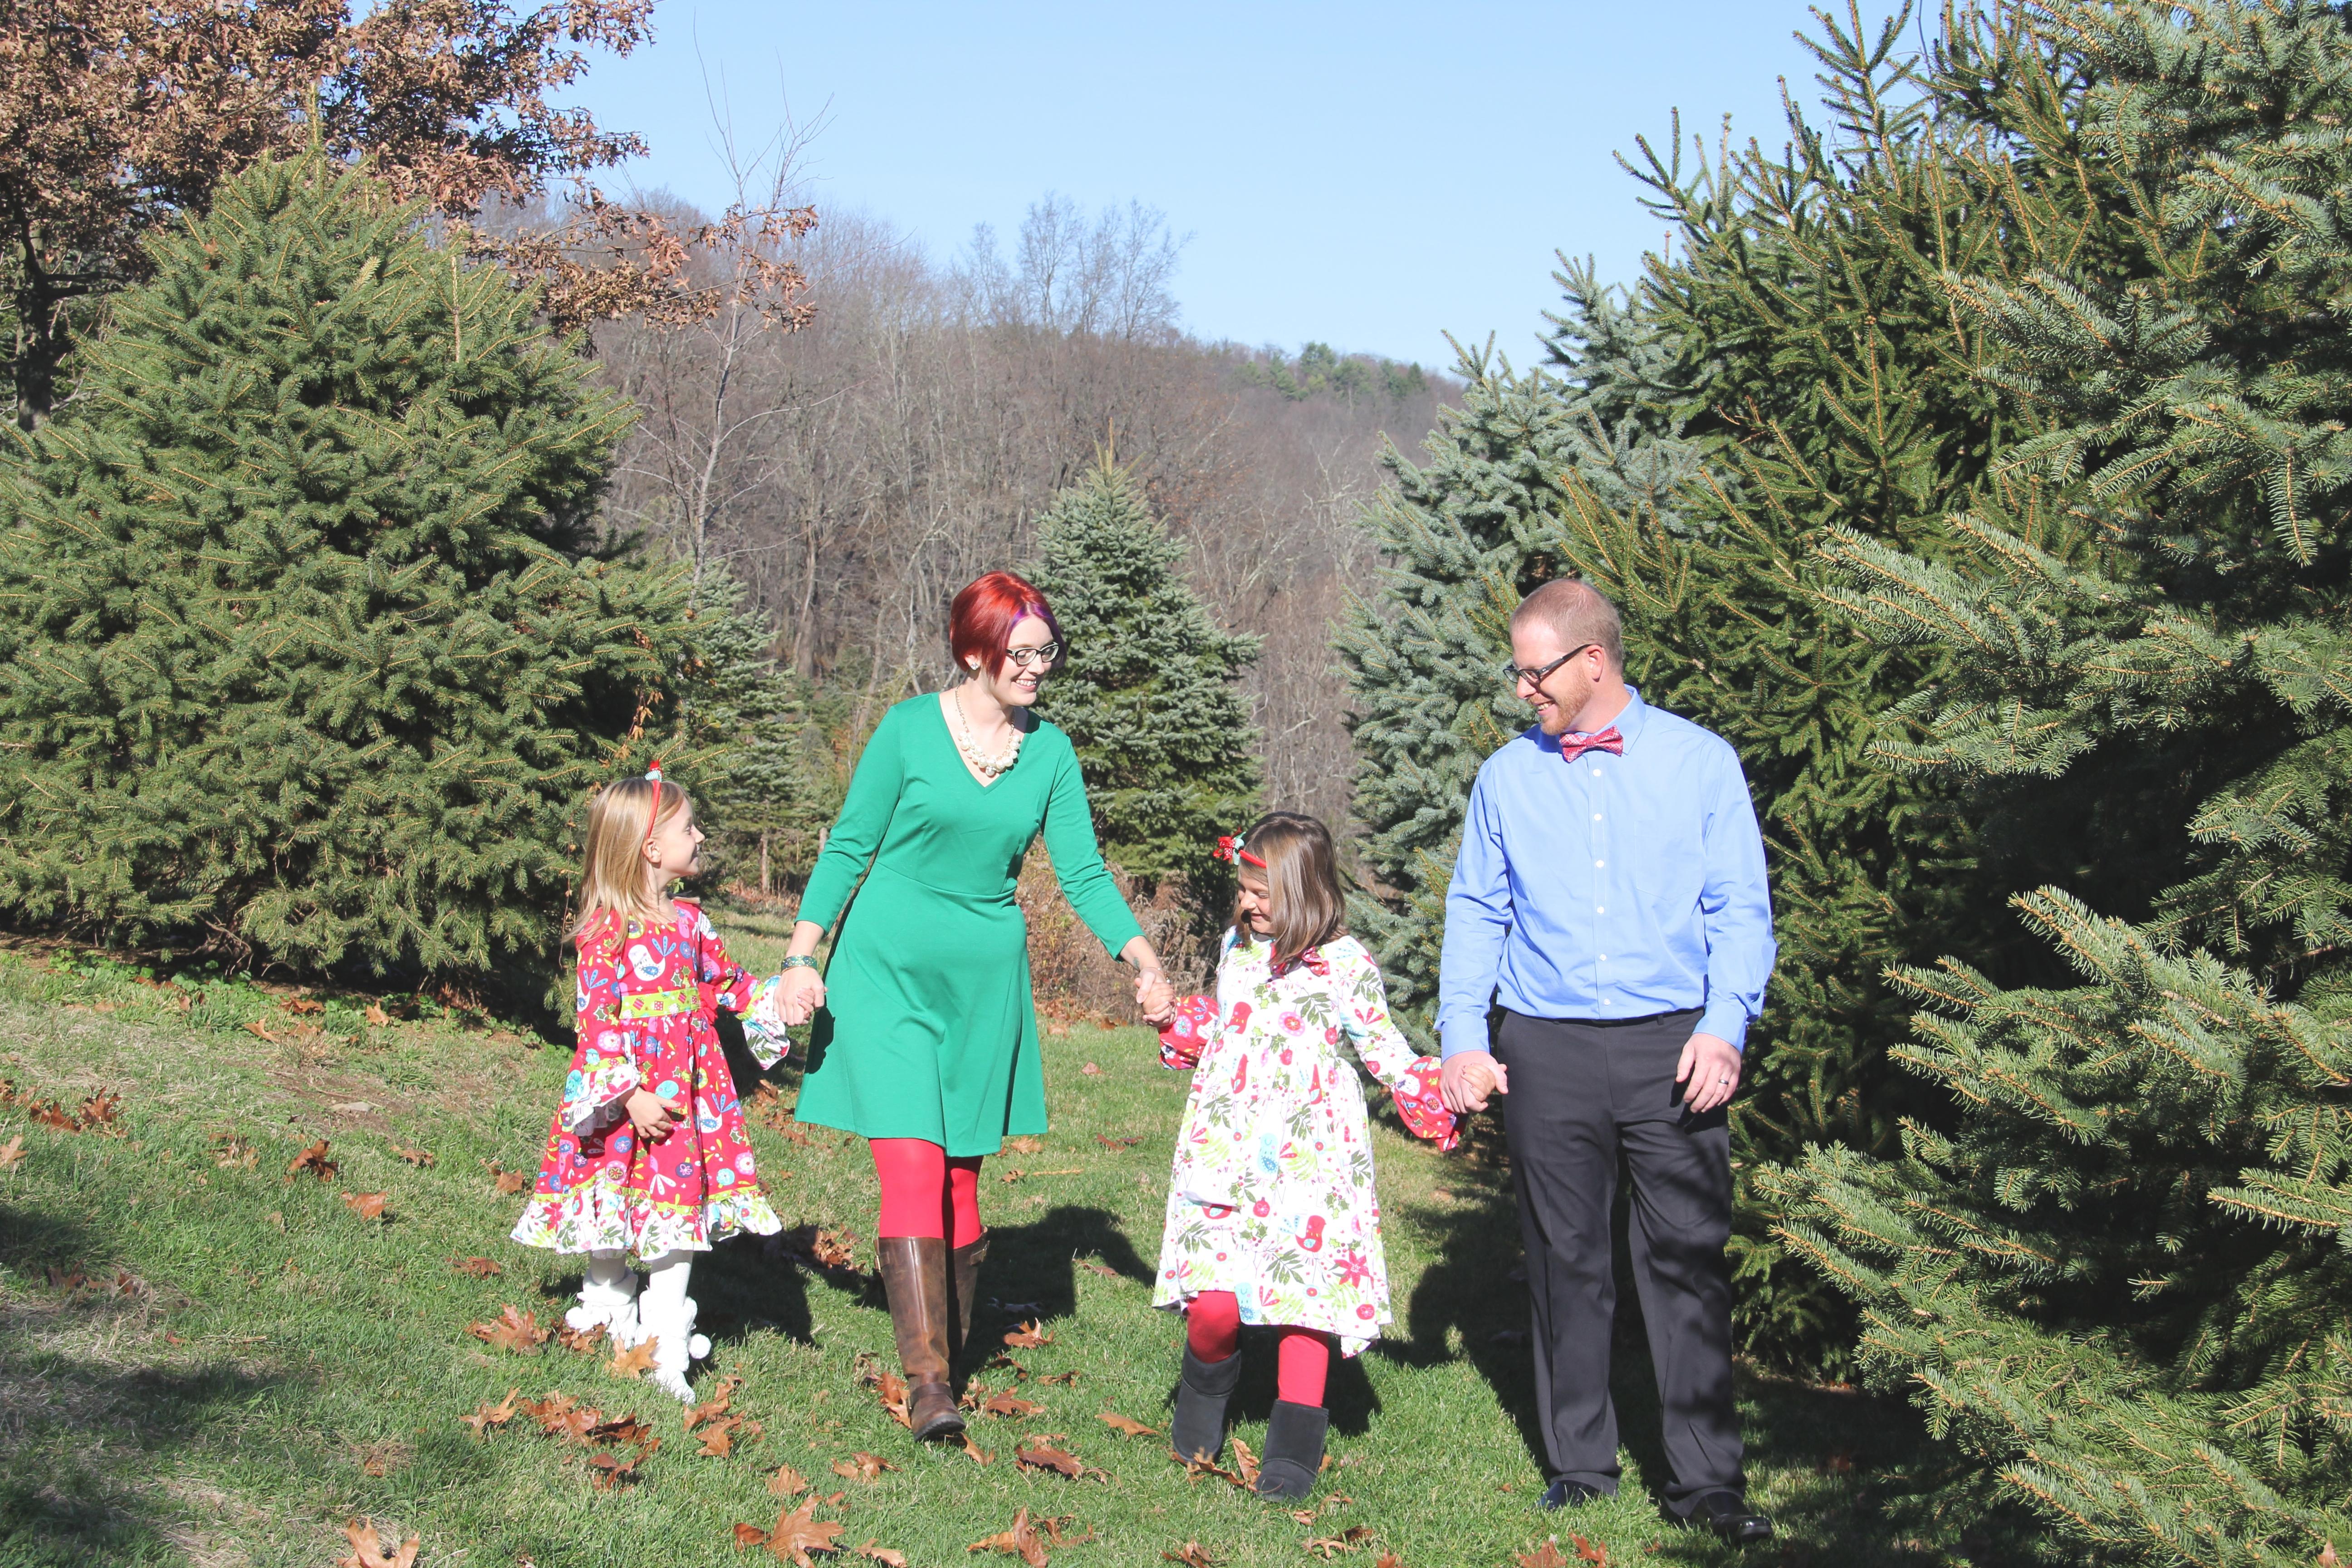 mough family hardwig photography